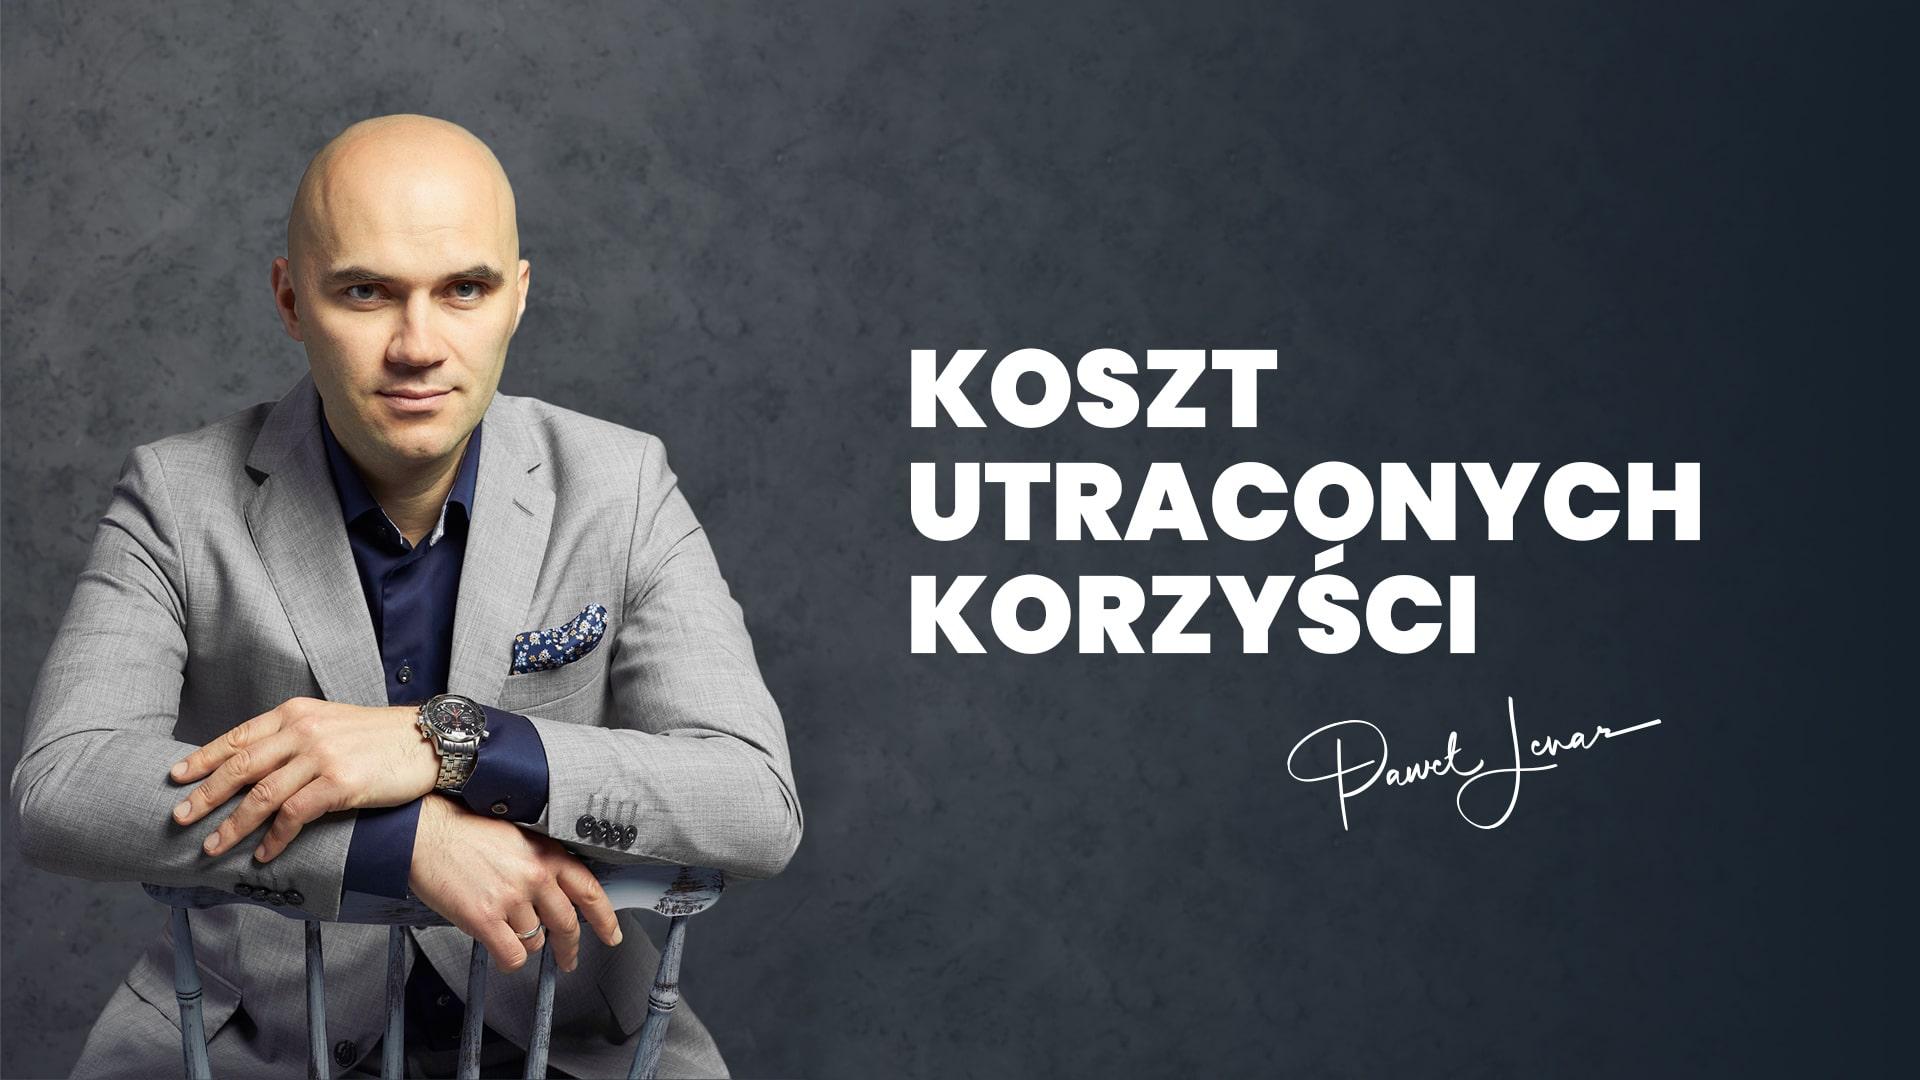 Koszt utraconych korzyści pawel lenar - Paweł Lenar Blog